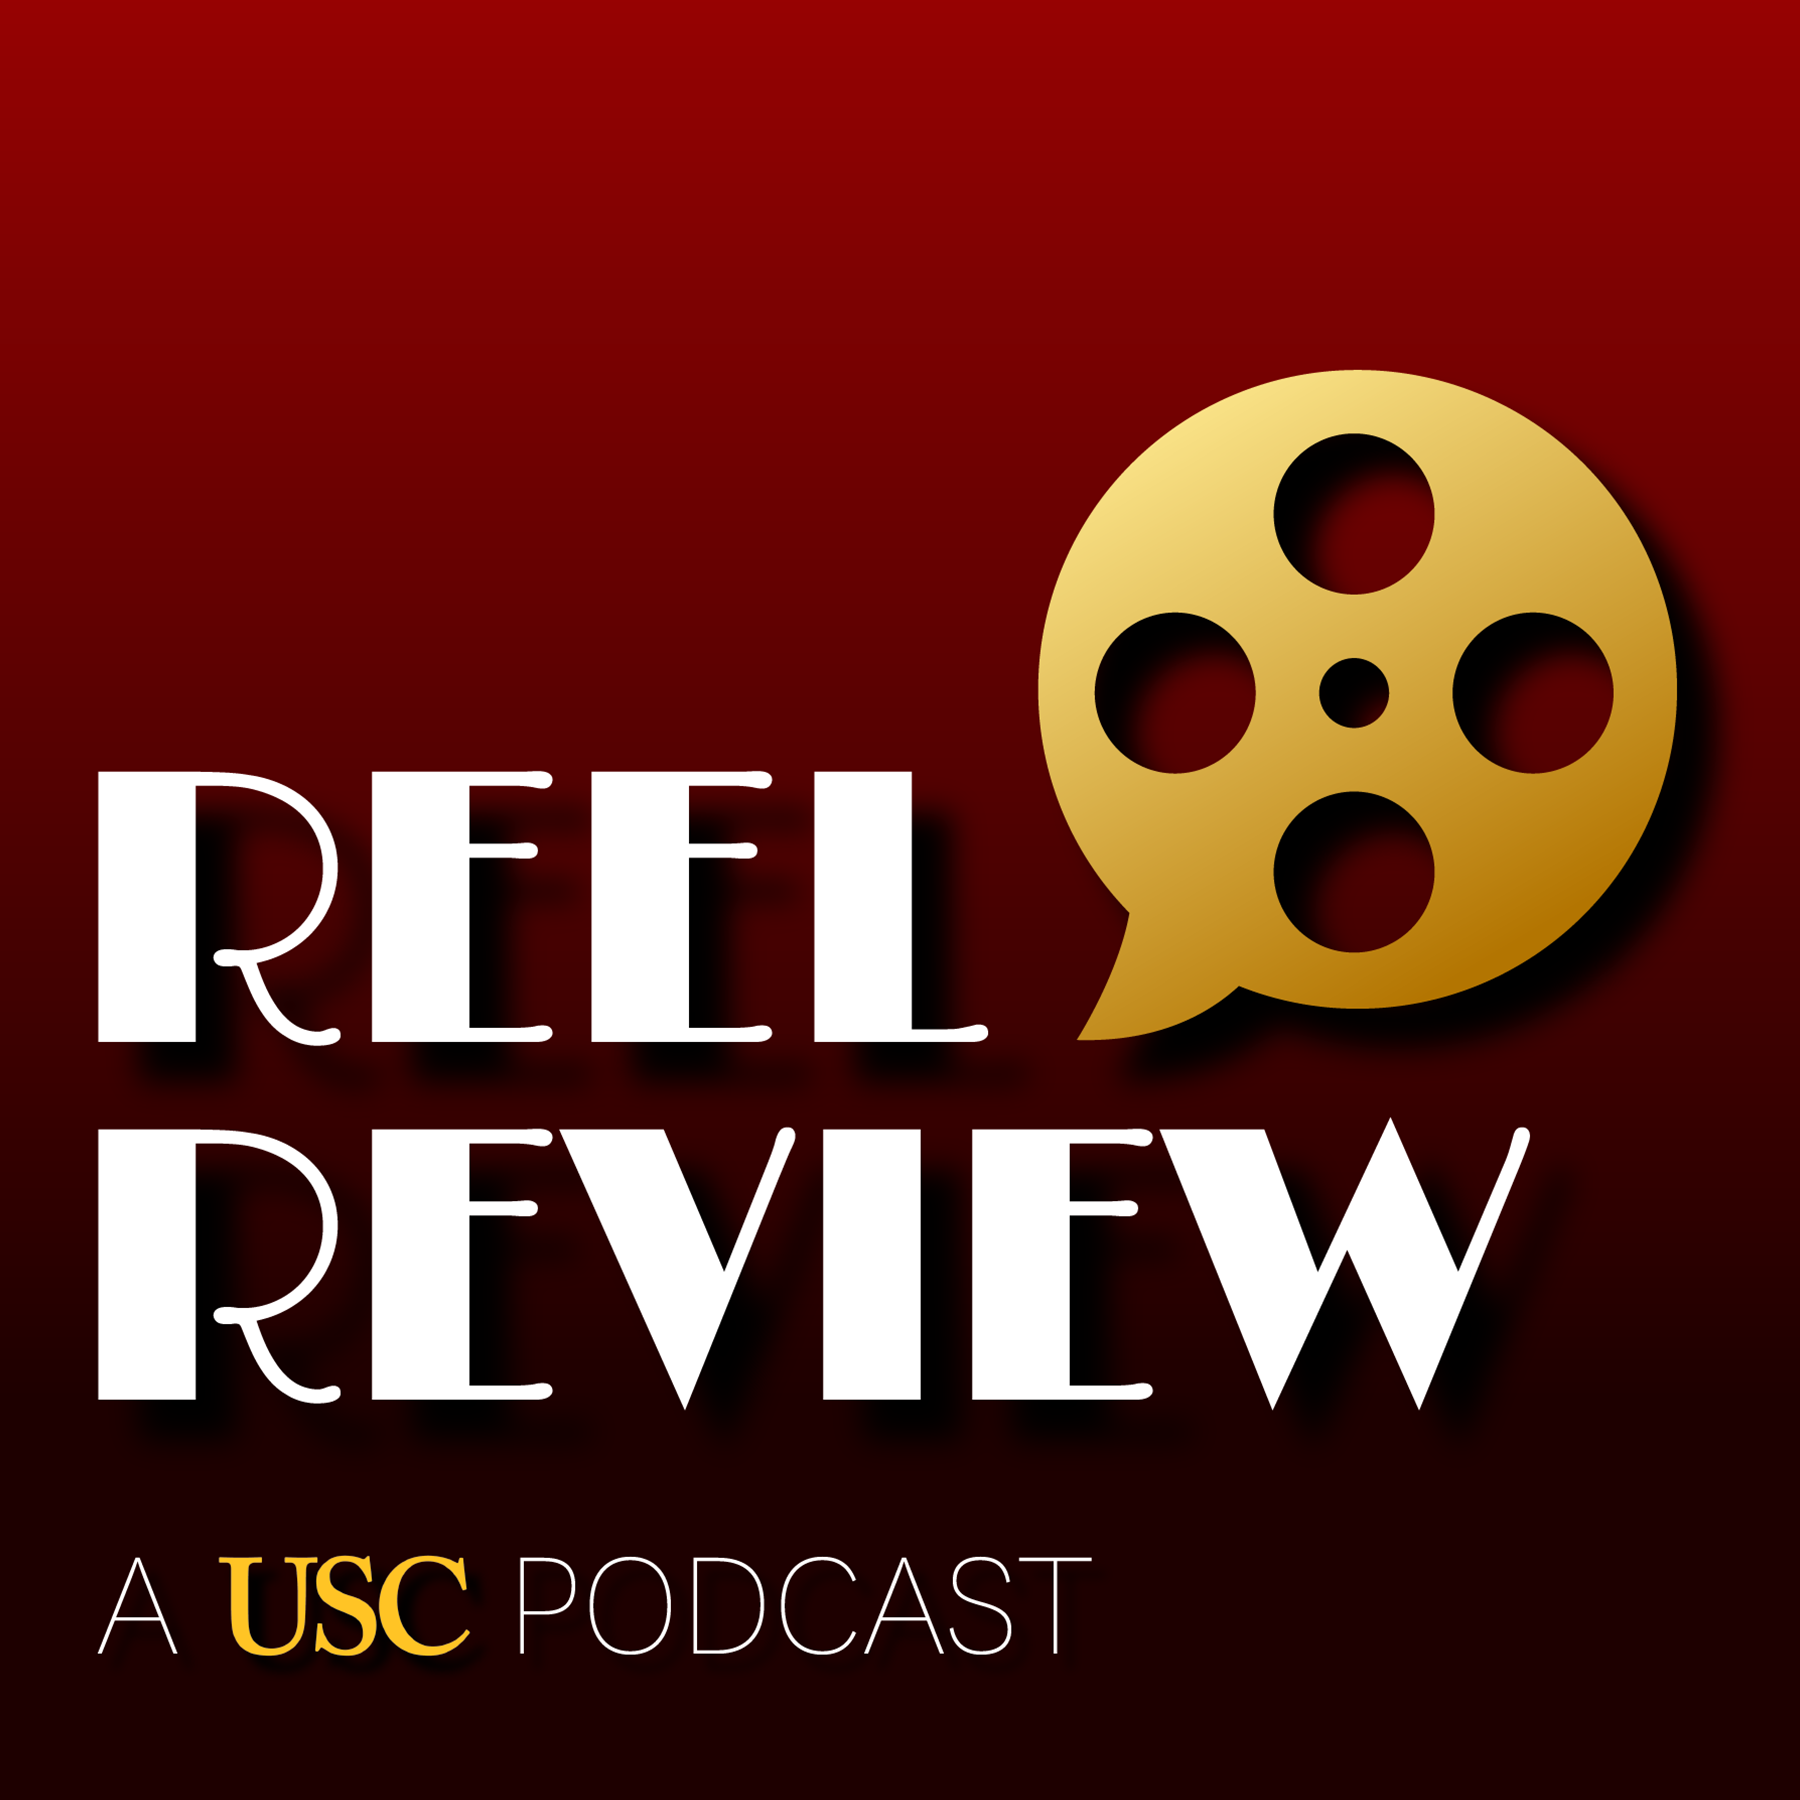 Reel Review show art